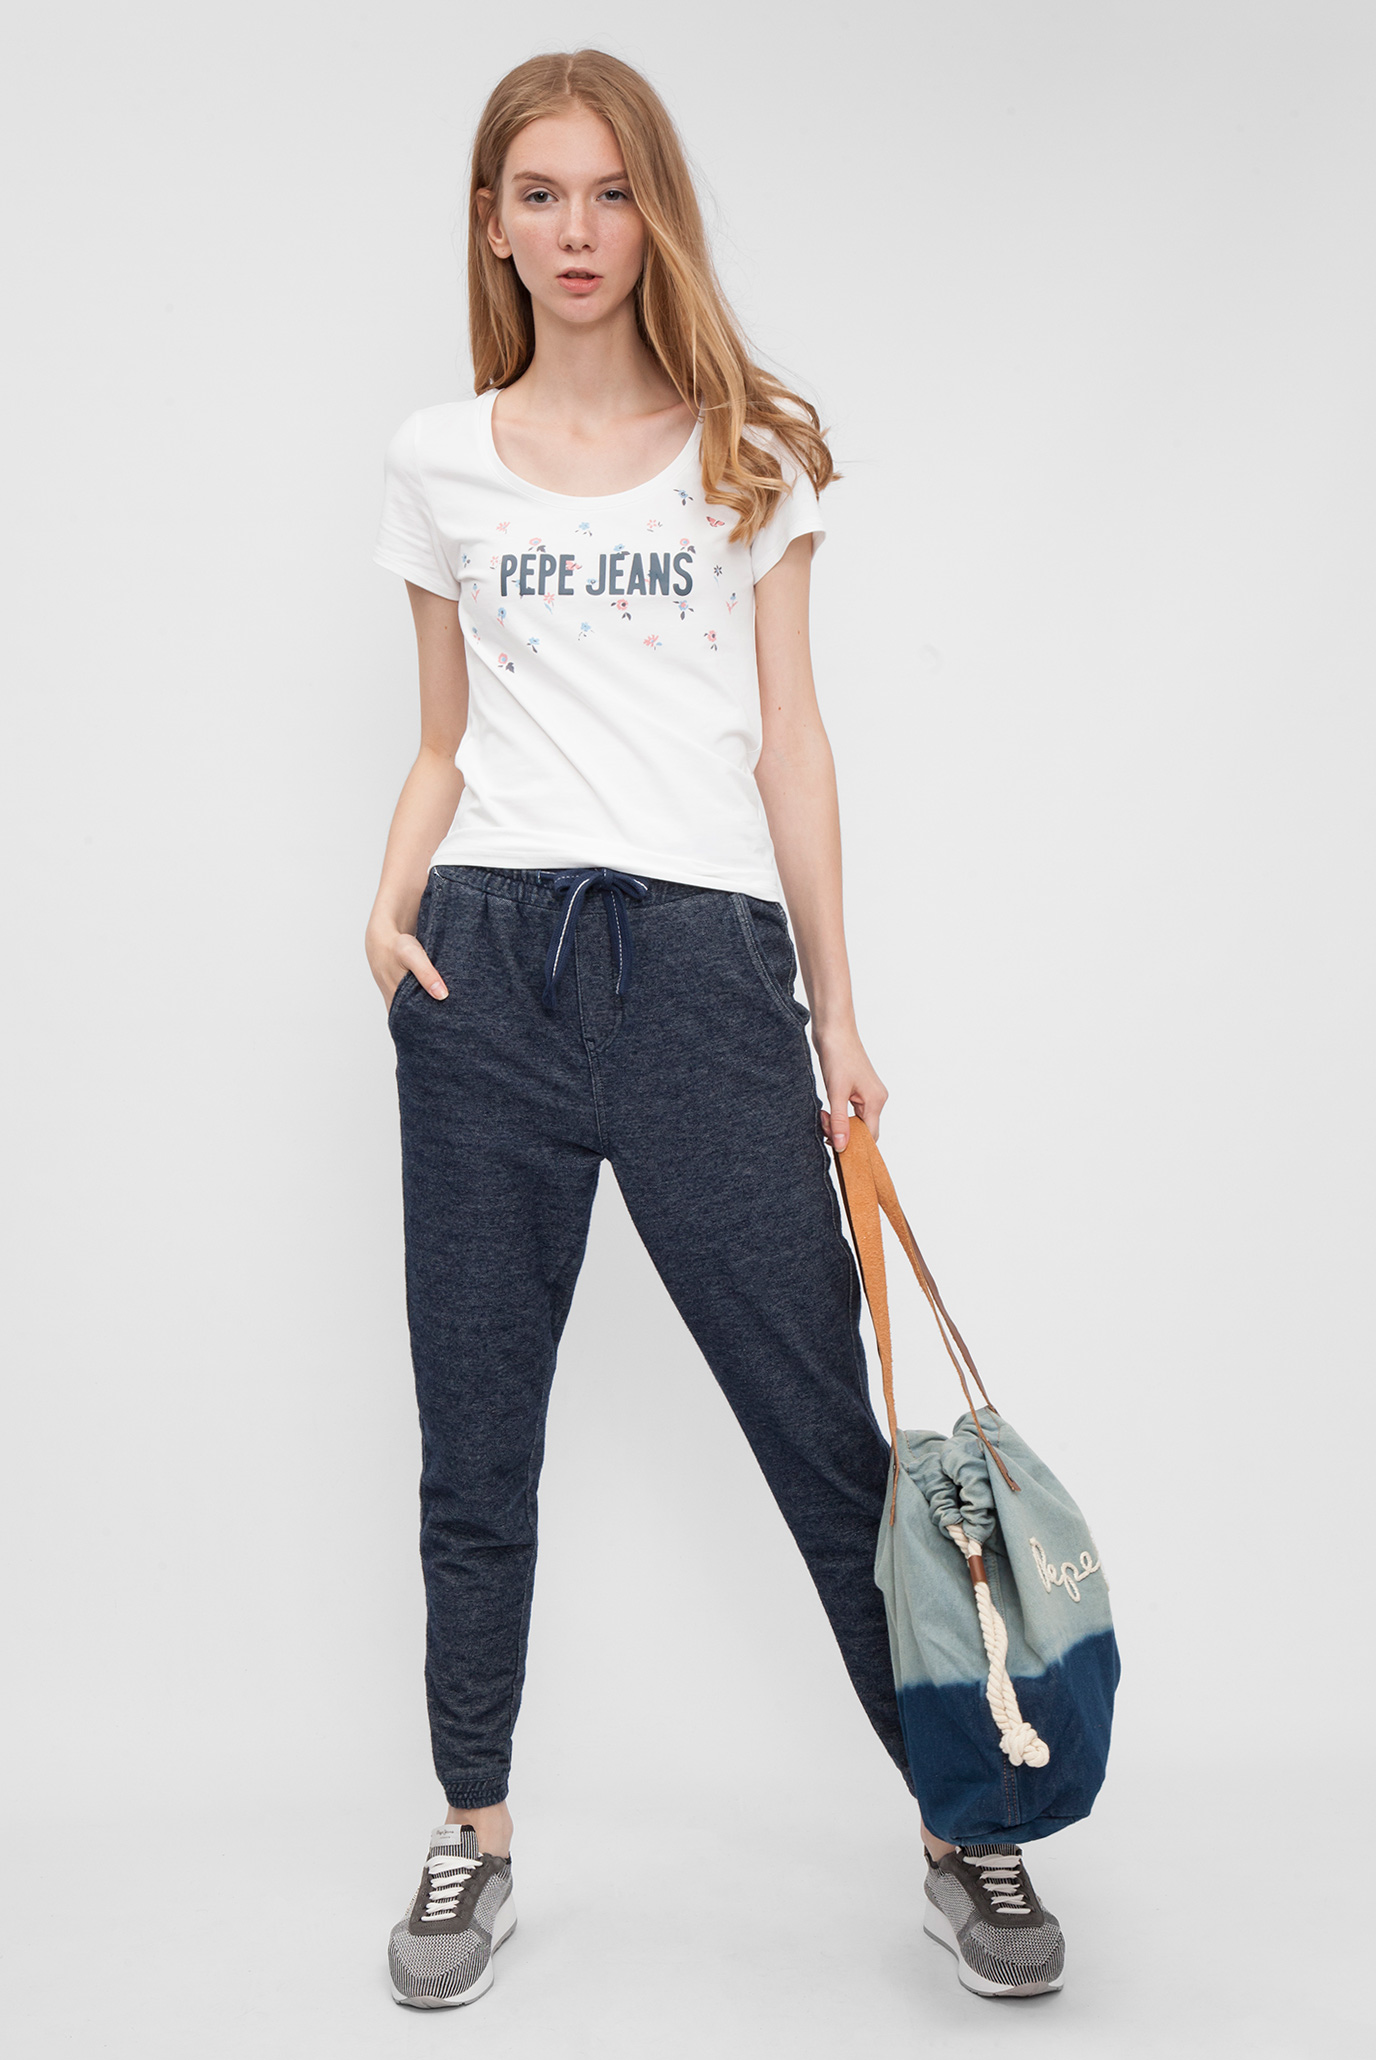 Женские синие спортивные брюки RITZY Pepe Jeans